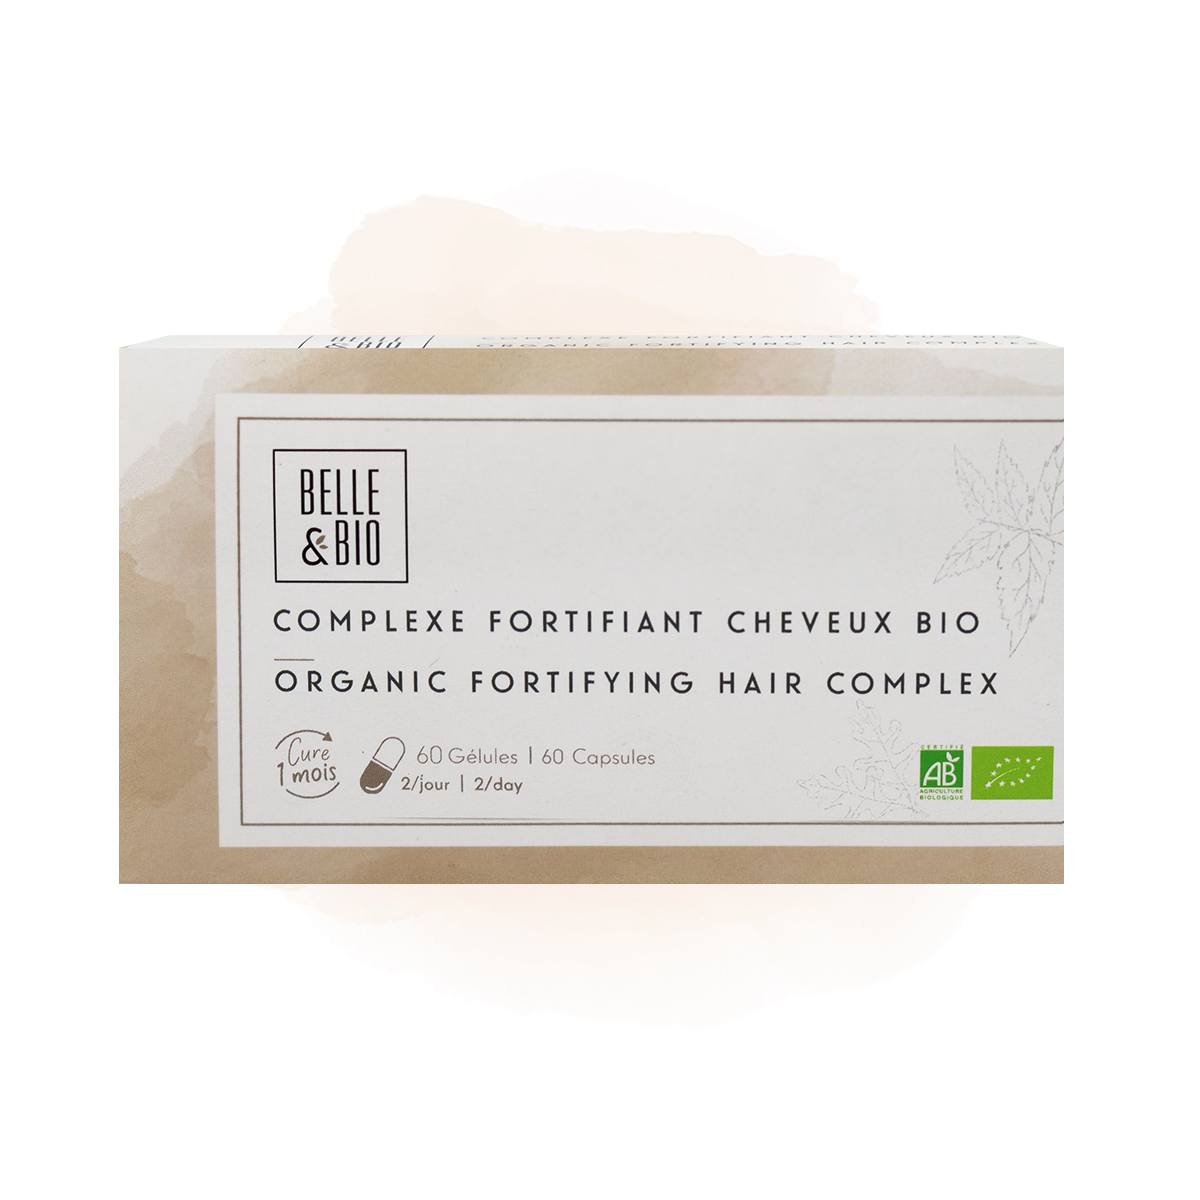 Belle & Bio - Complexe Fortifiant Cheveux Bio